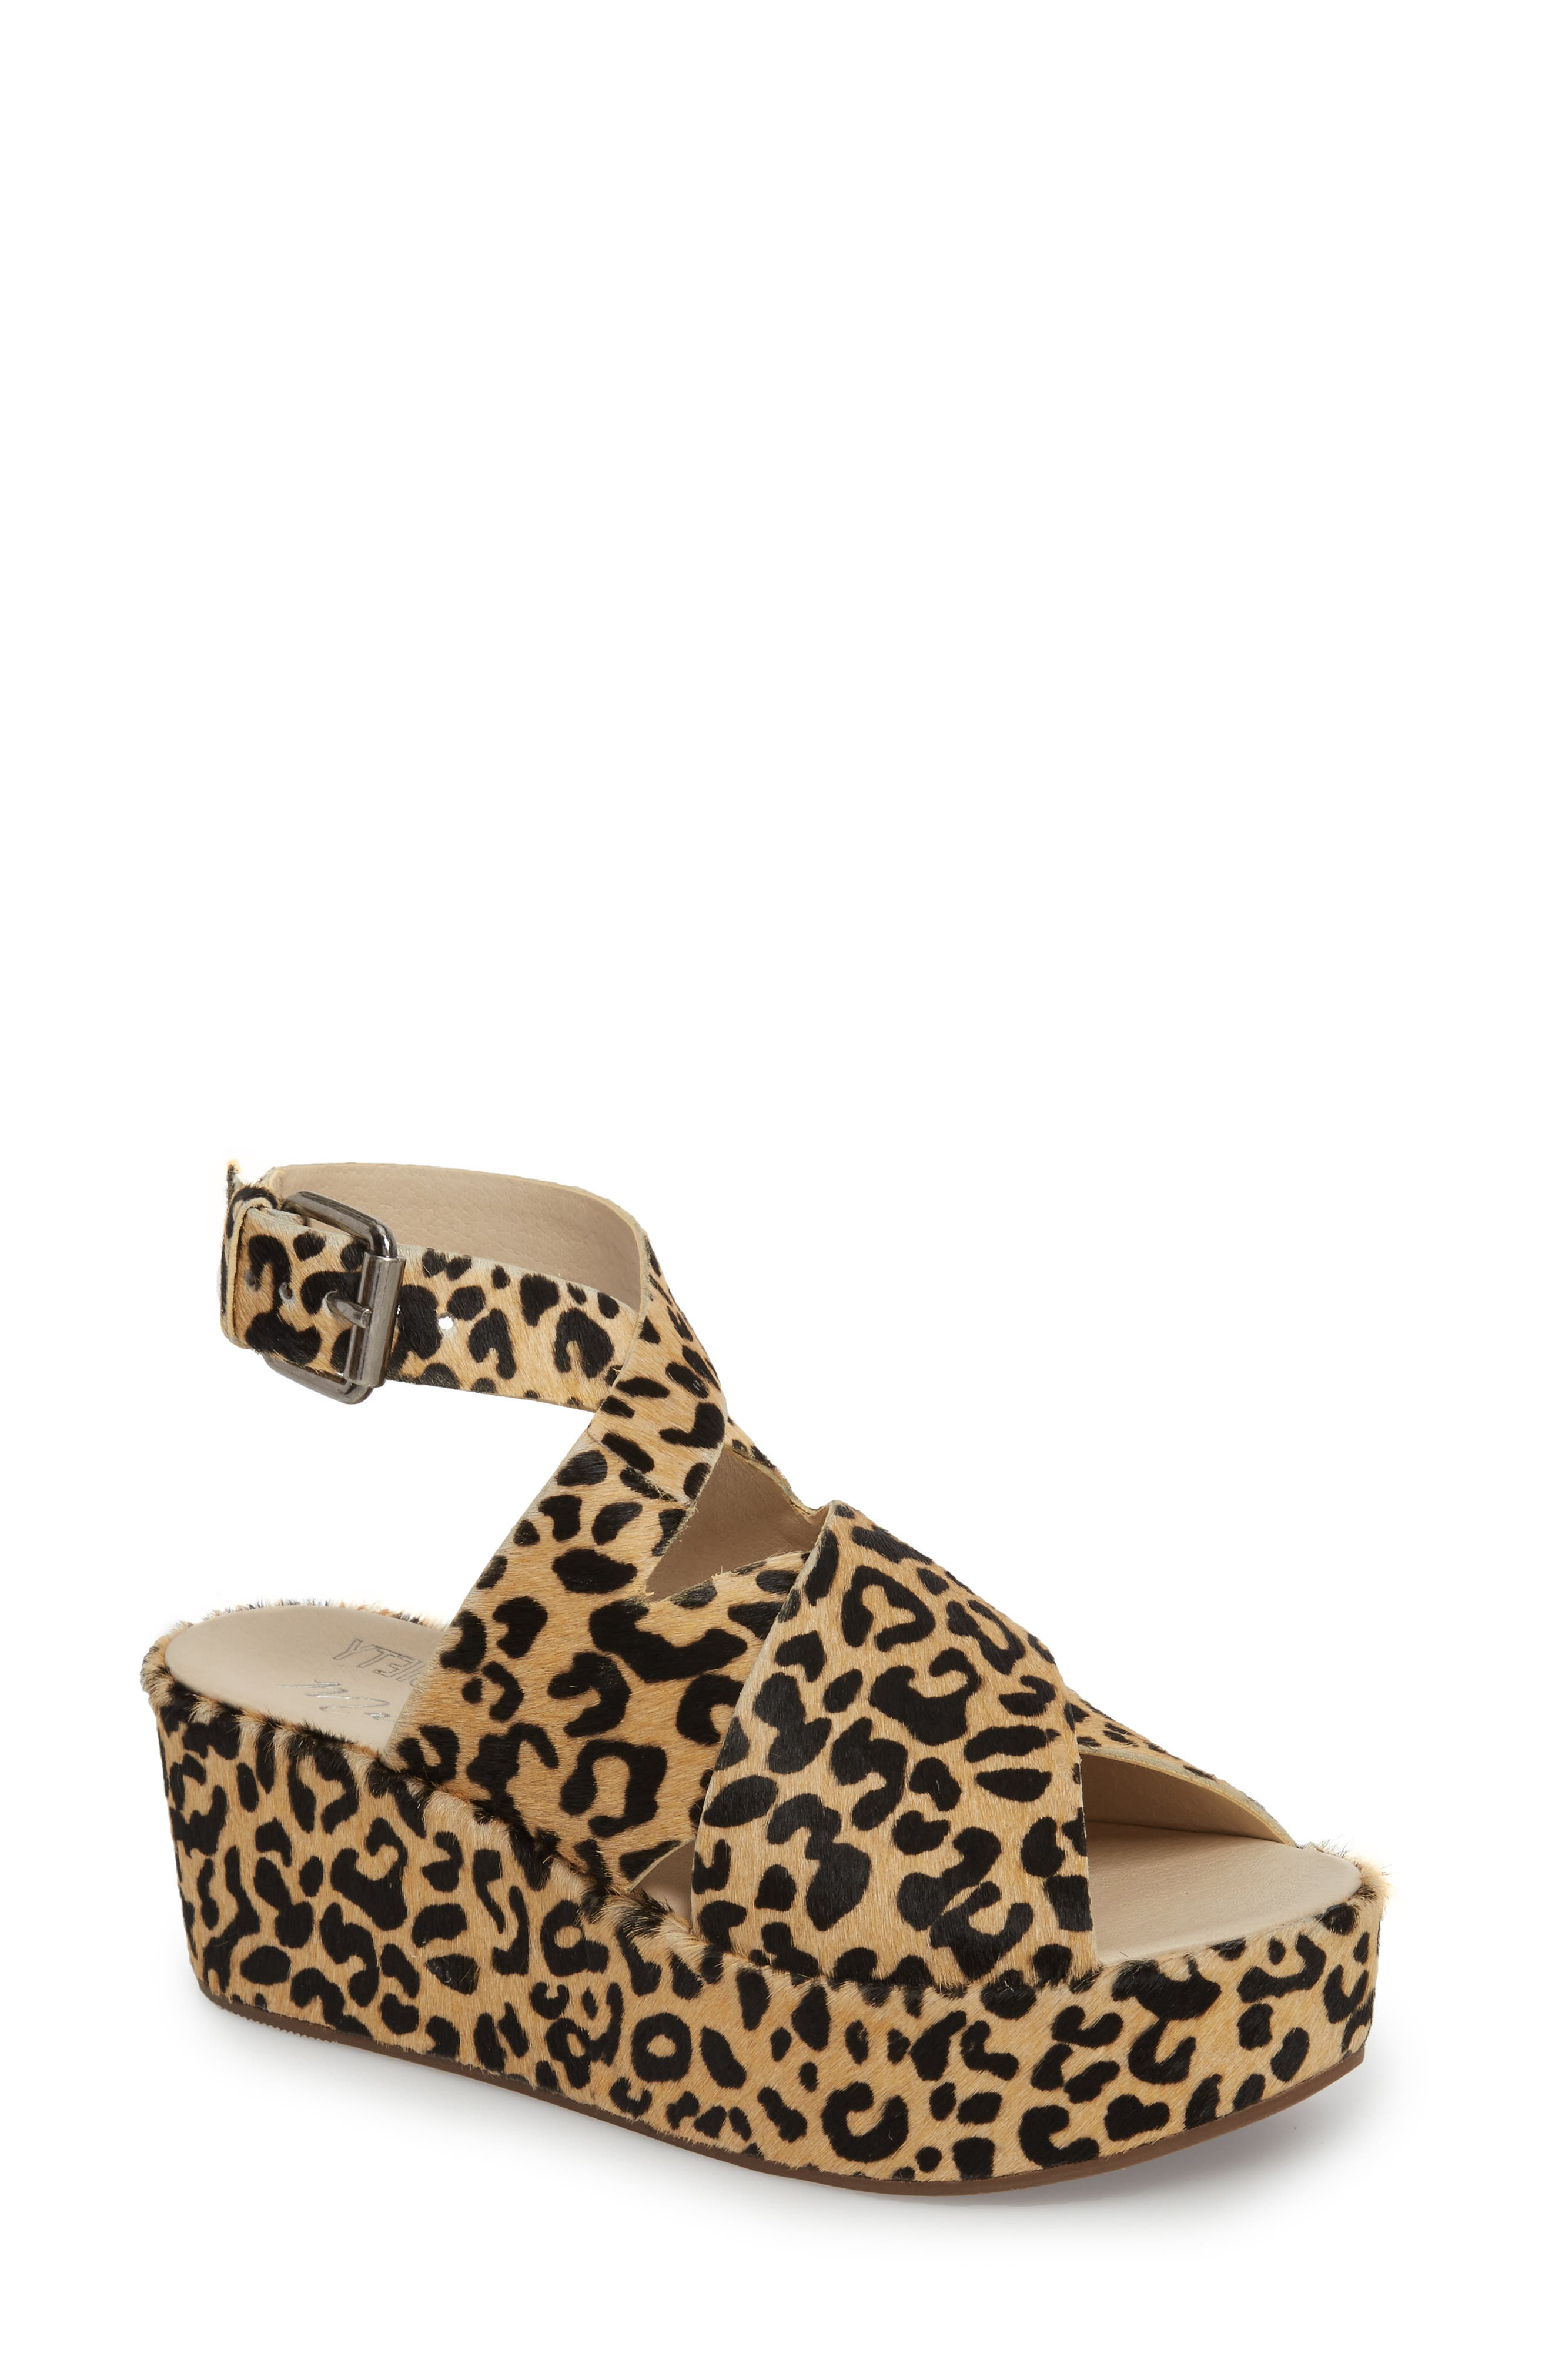 Runway Wedge Sandal,                             Main thumbnail 1, color,                             Leopard Calf Hair